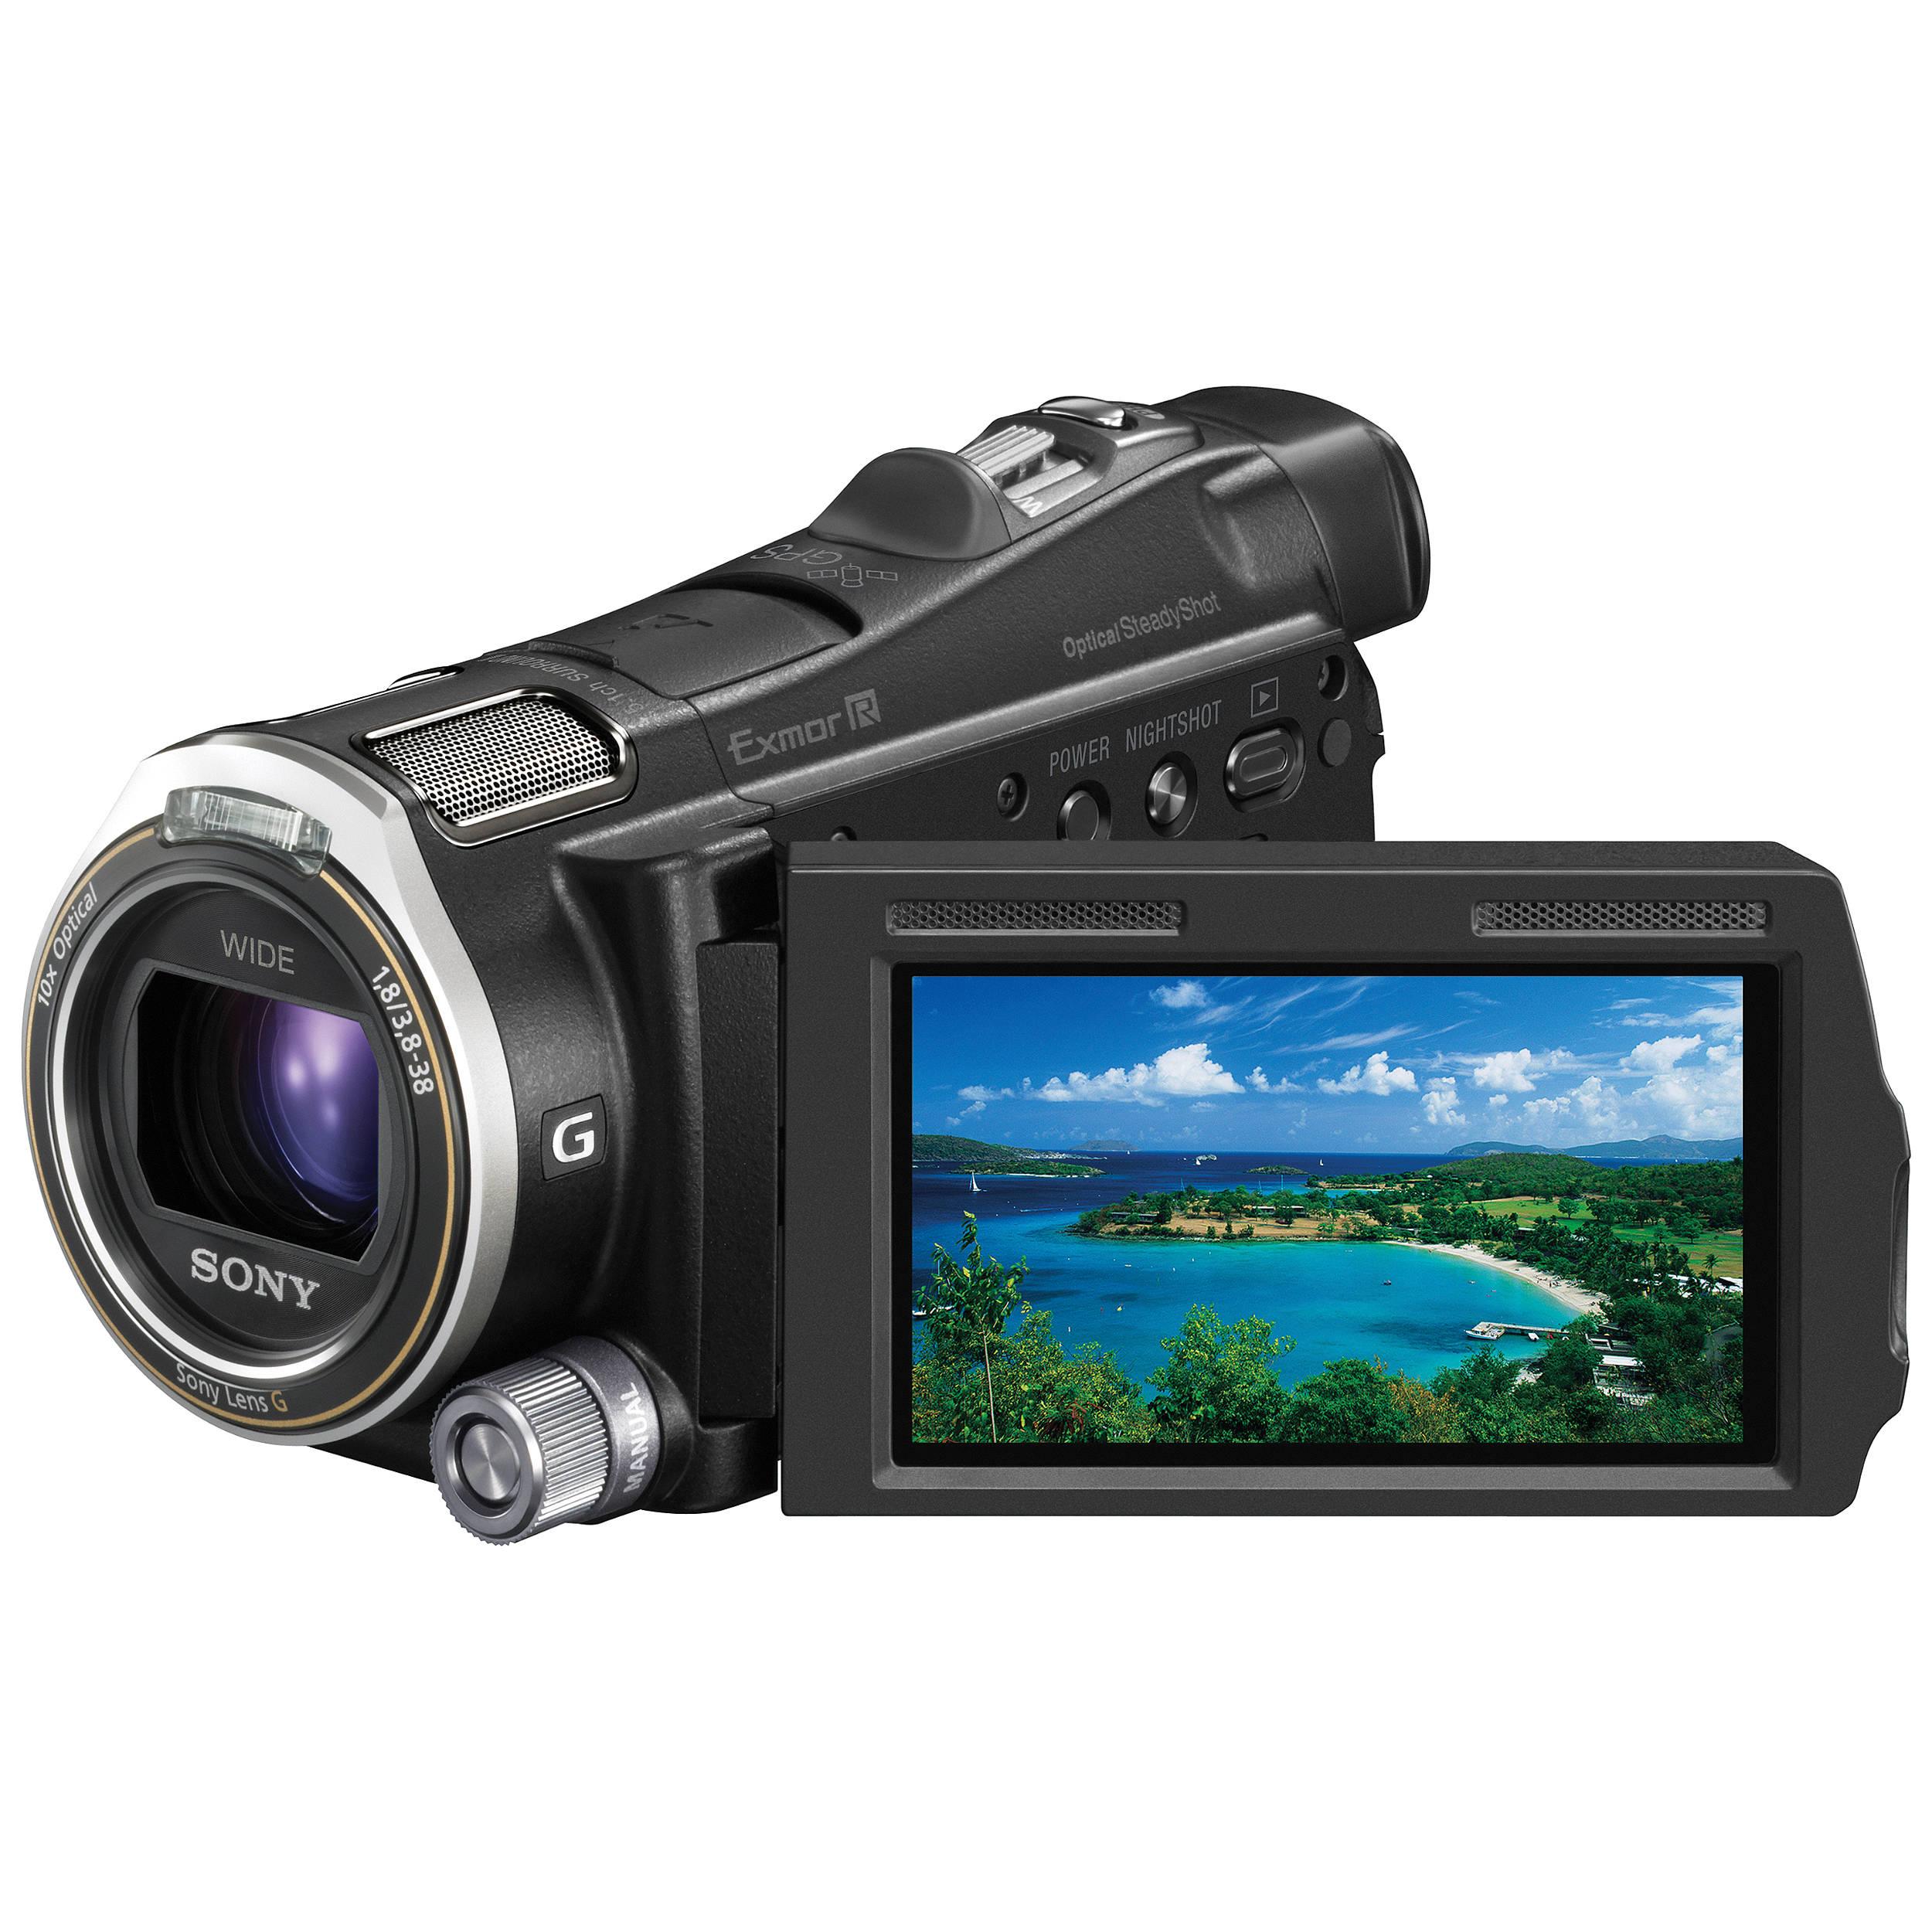 sony hdr cx700v camcorder hdr cx700v b h photo video rh bhphotovideo com Sony 4K Camcorder Samsung Camcorder